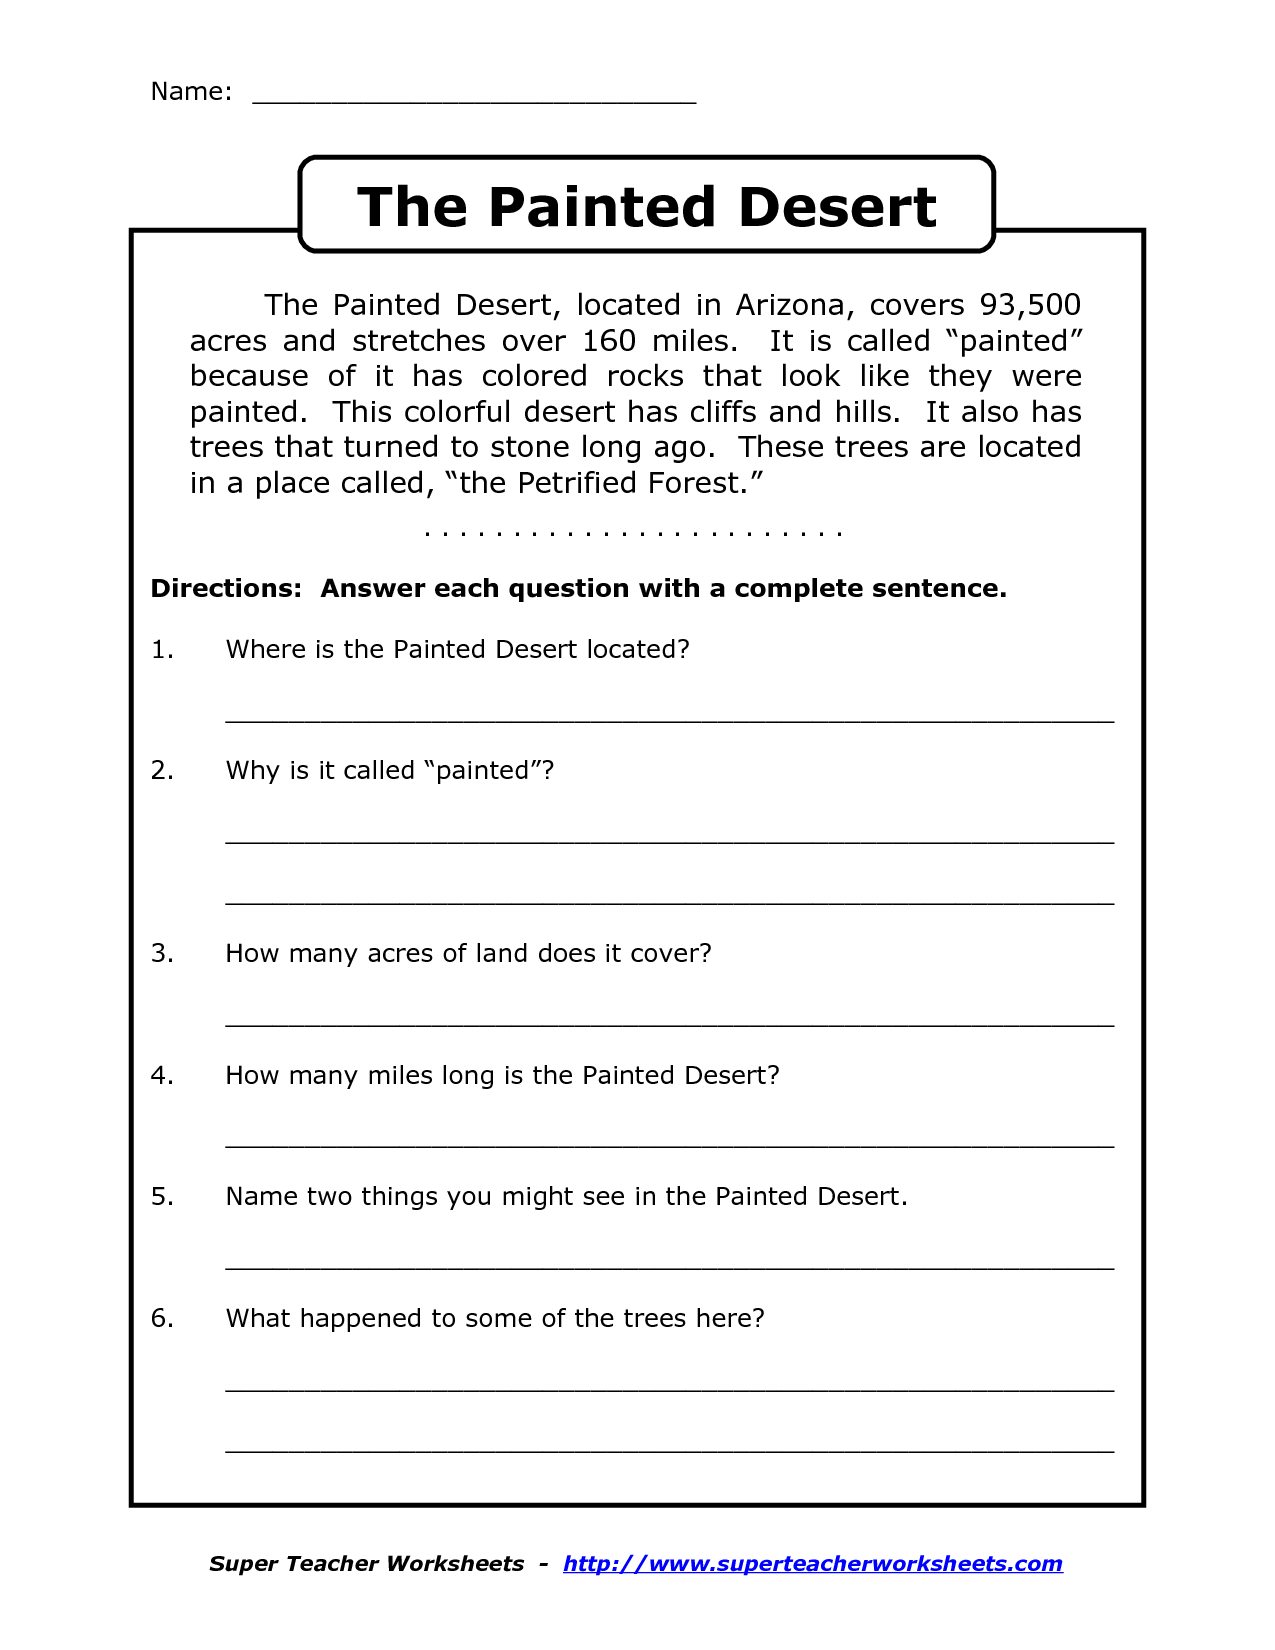 Reading Worksheets For 4Th Grade   Reading Comprehension Worksheets   Printable Reading Worksheets 4Th Grade